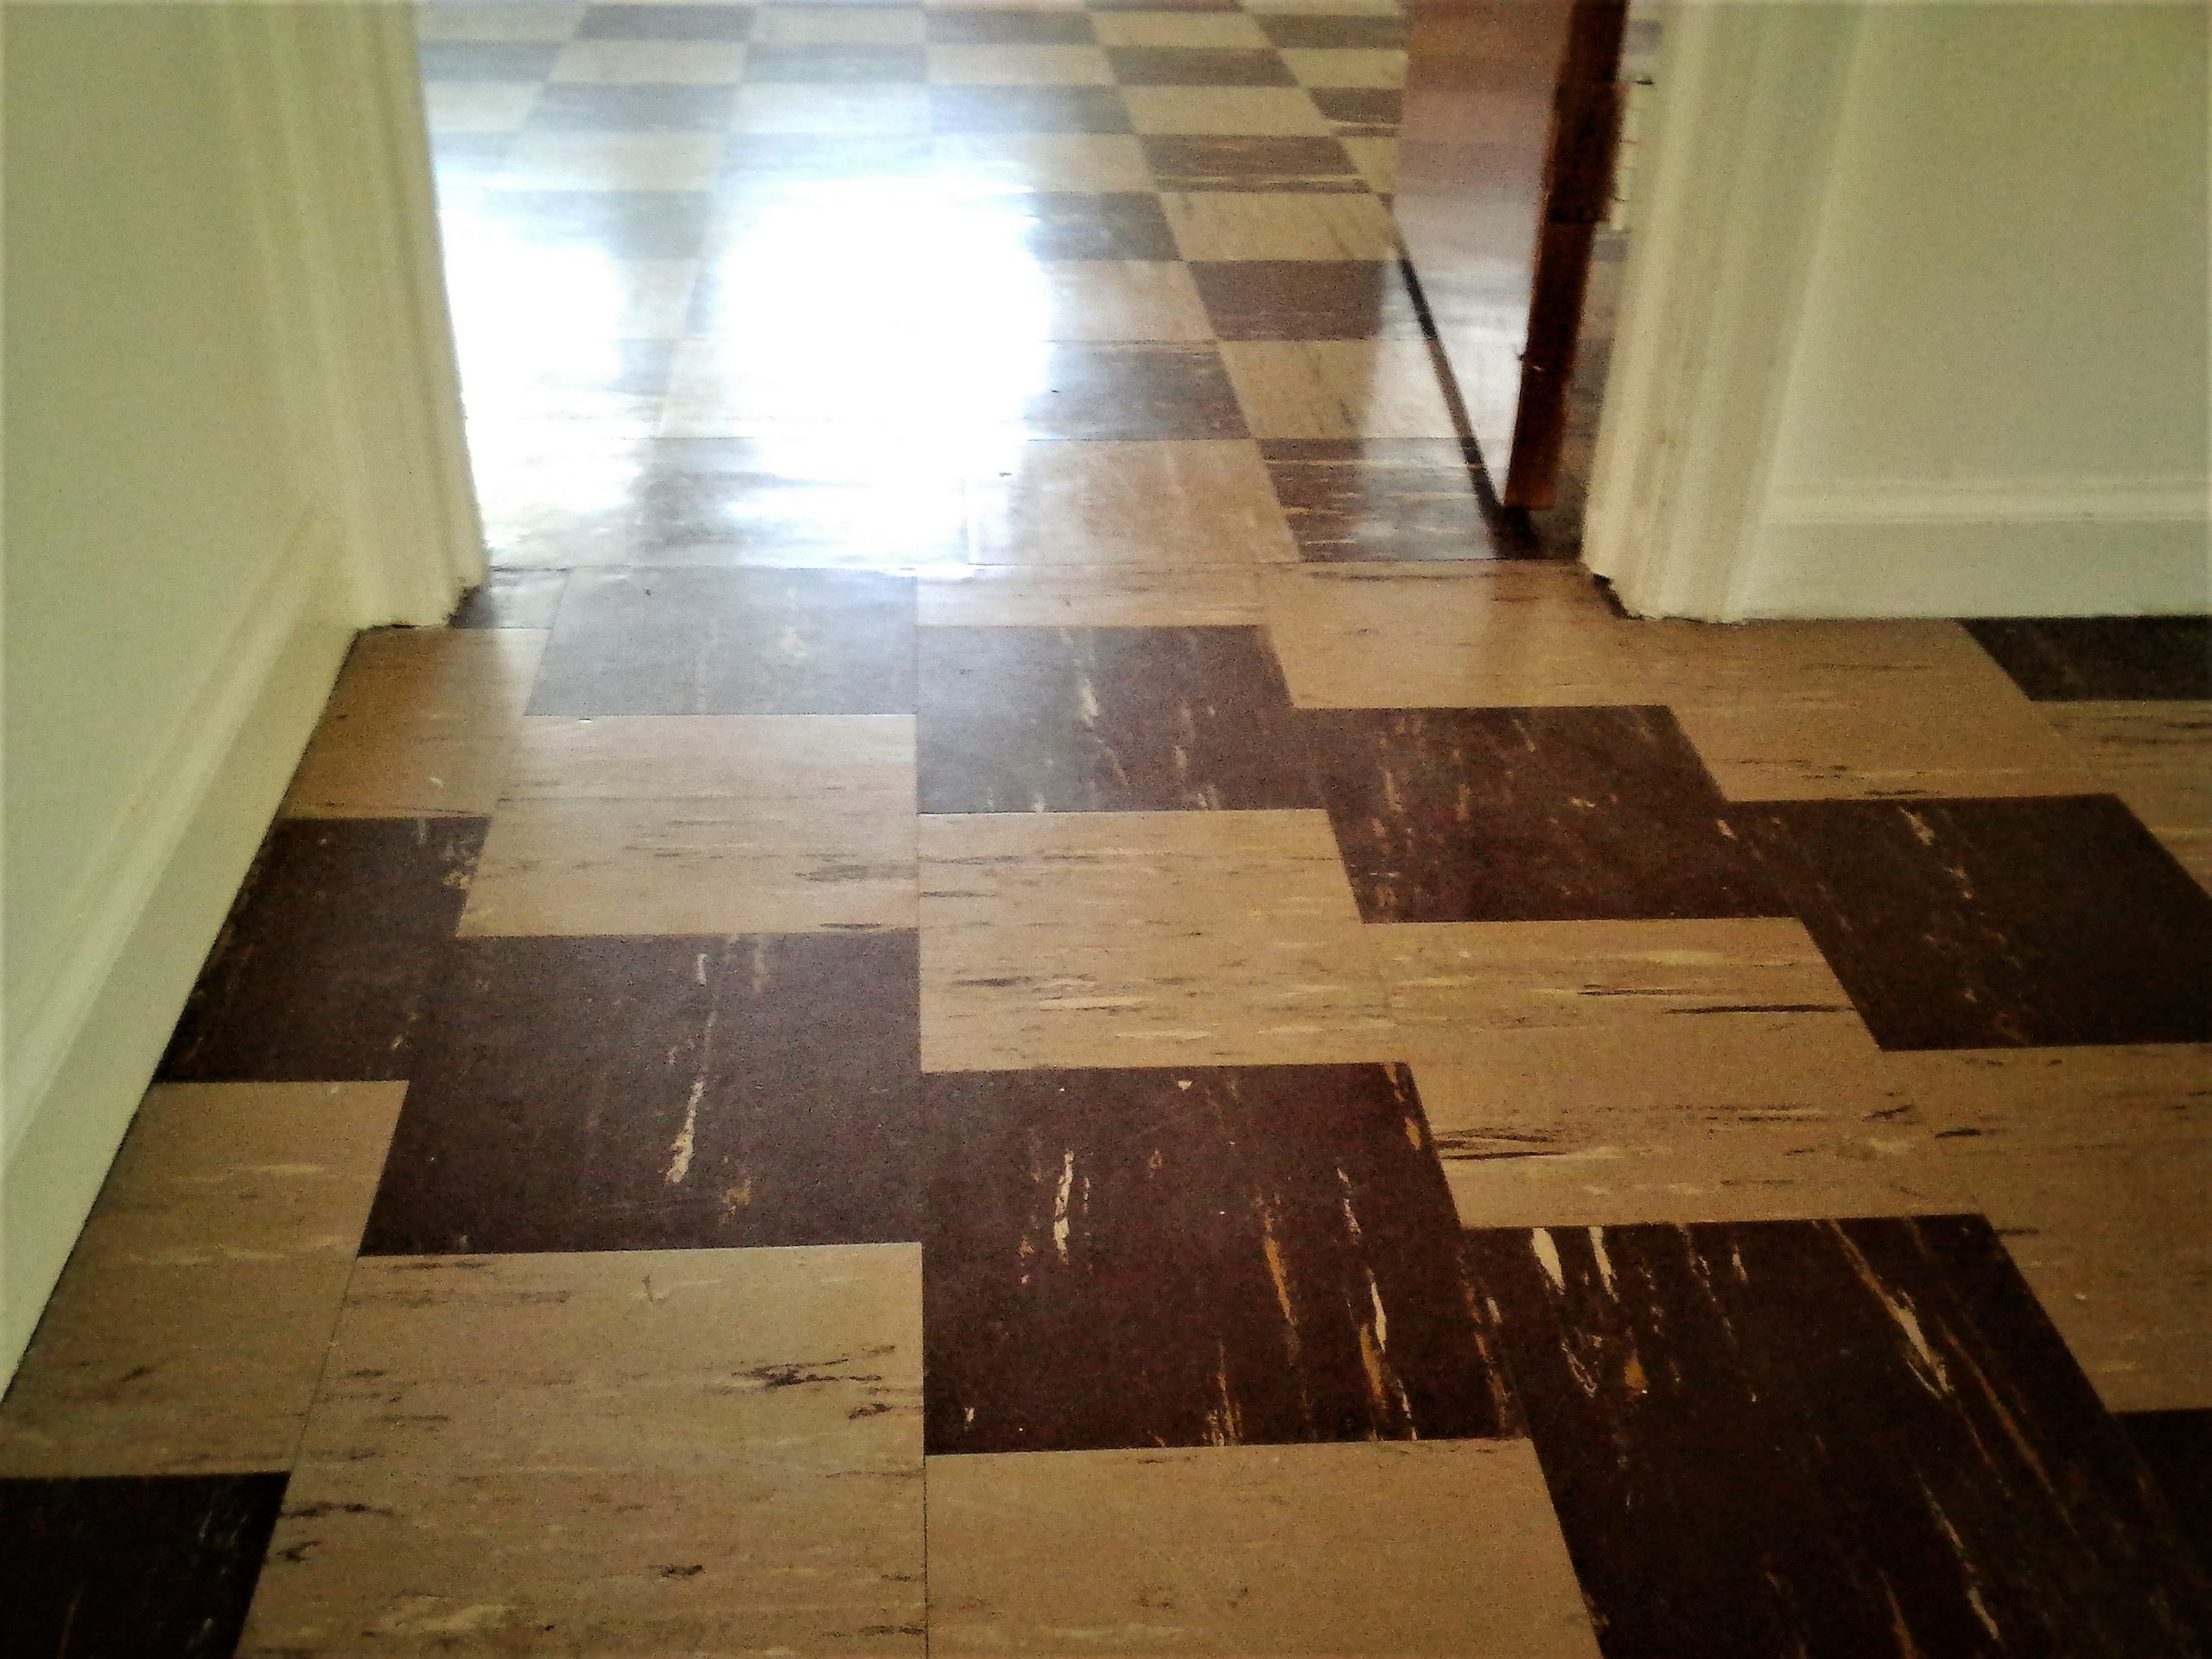 Hardwood Floor Underlayment Necessary Of asbestos Flooring Do You Really Need that Abatement the Flooring Blog Inside Old Vinyl asbestos Tile Flooring